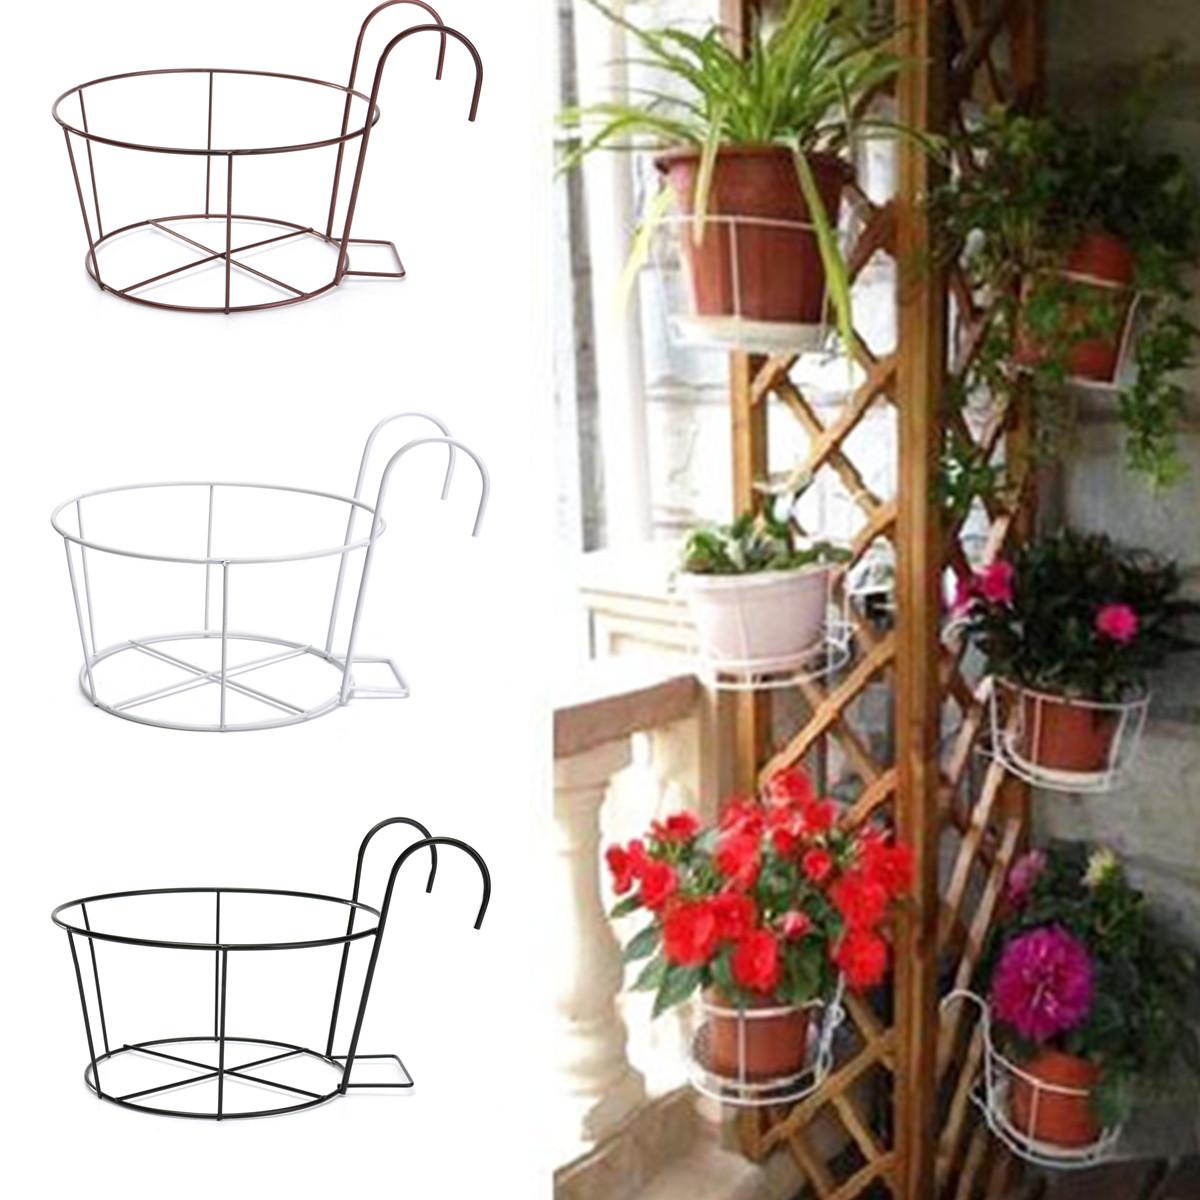 Metal iron flower pot hanging balcony garden plant planter home decor basket white intl - Metal hanging planter ...